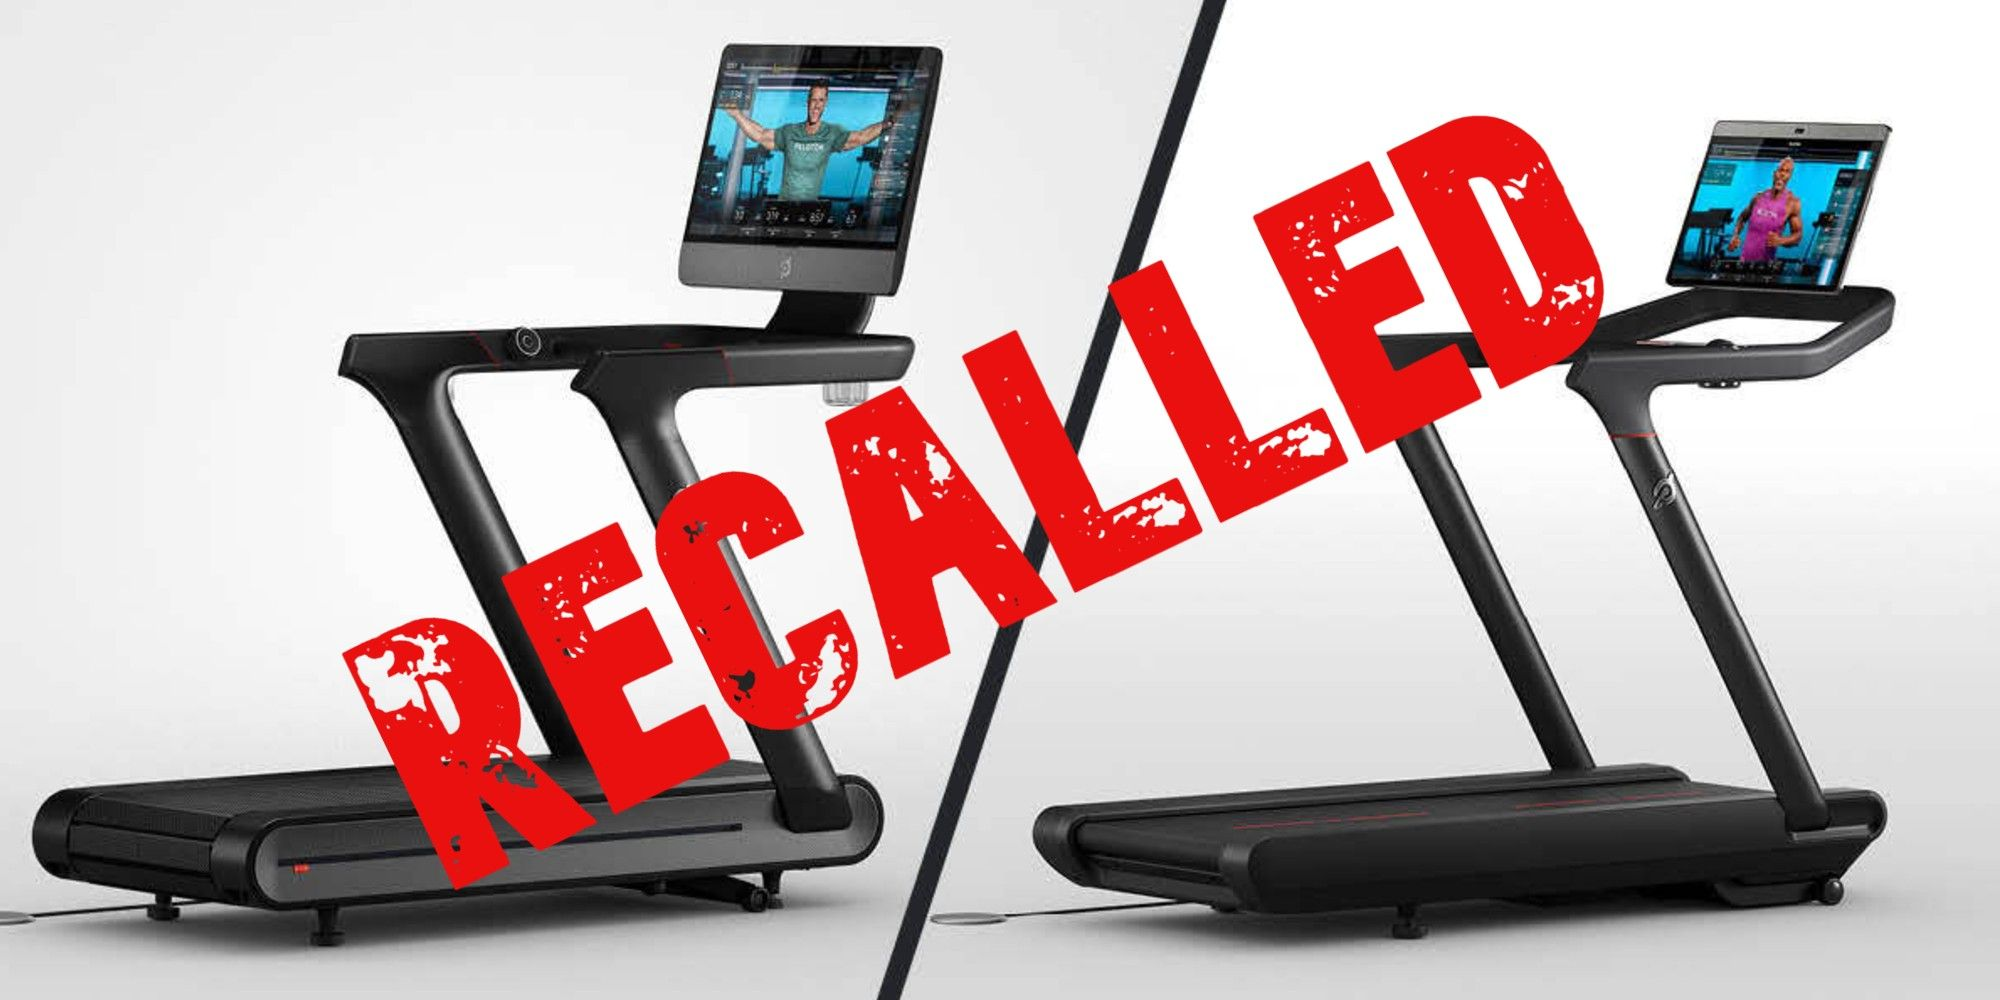 Peloton Treadmill Recall: What You Need To Know & Do Next